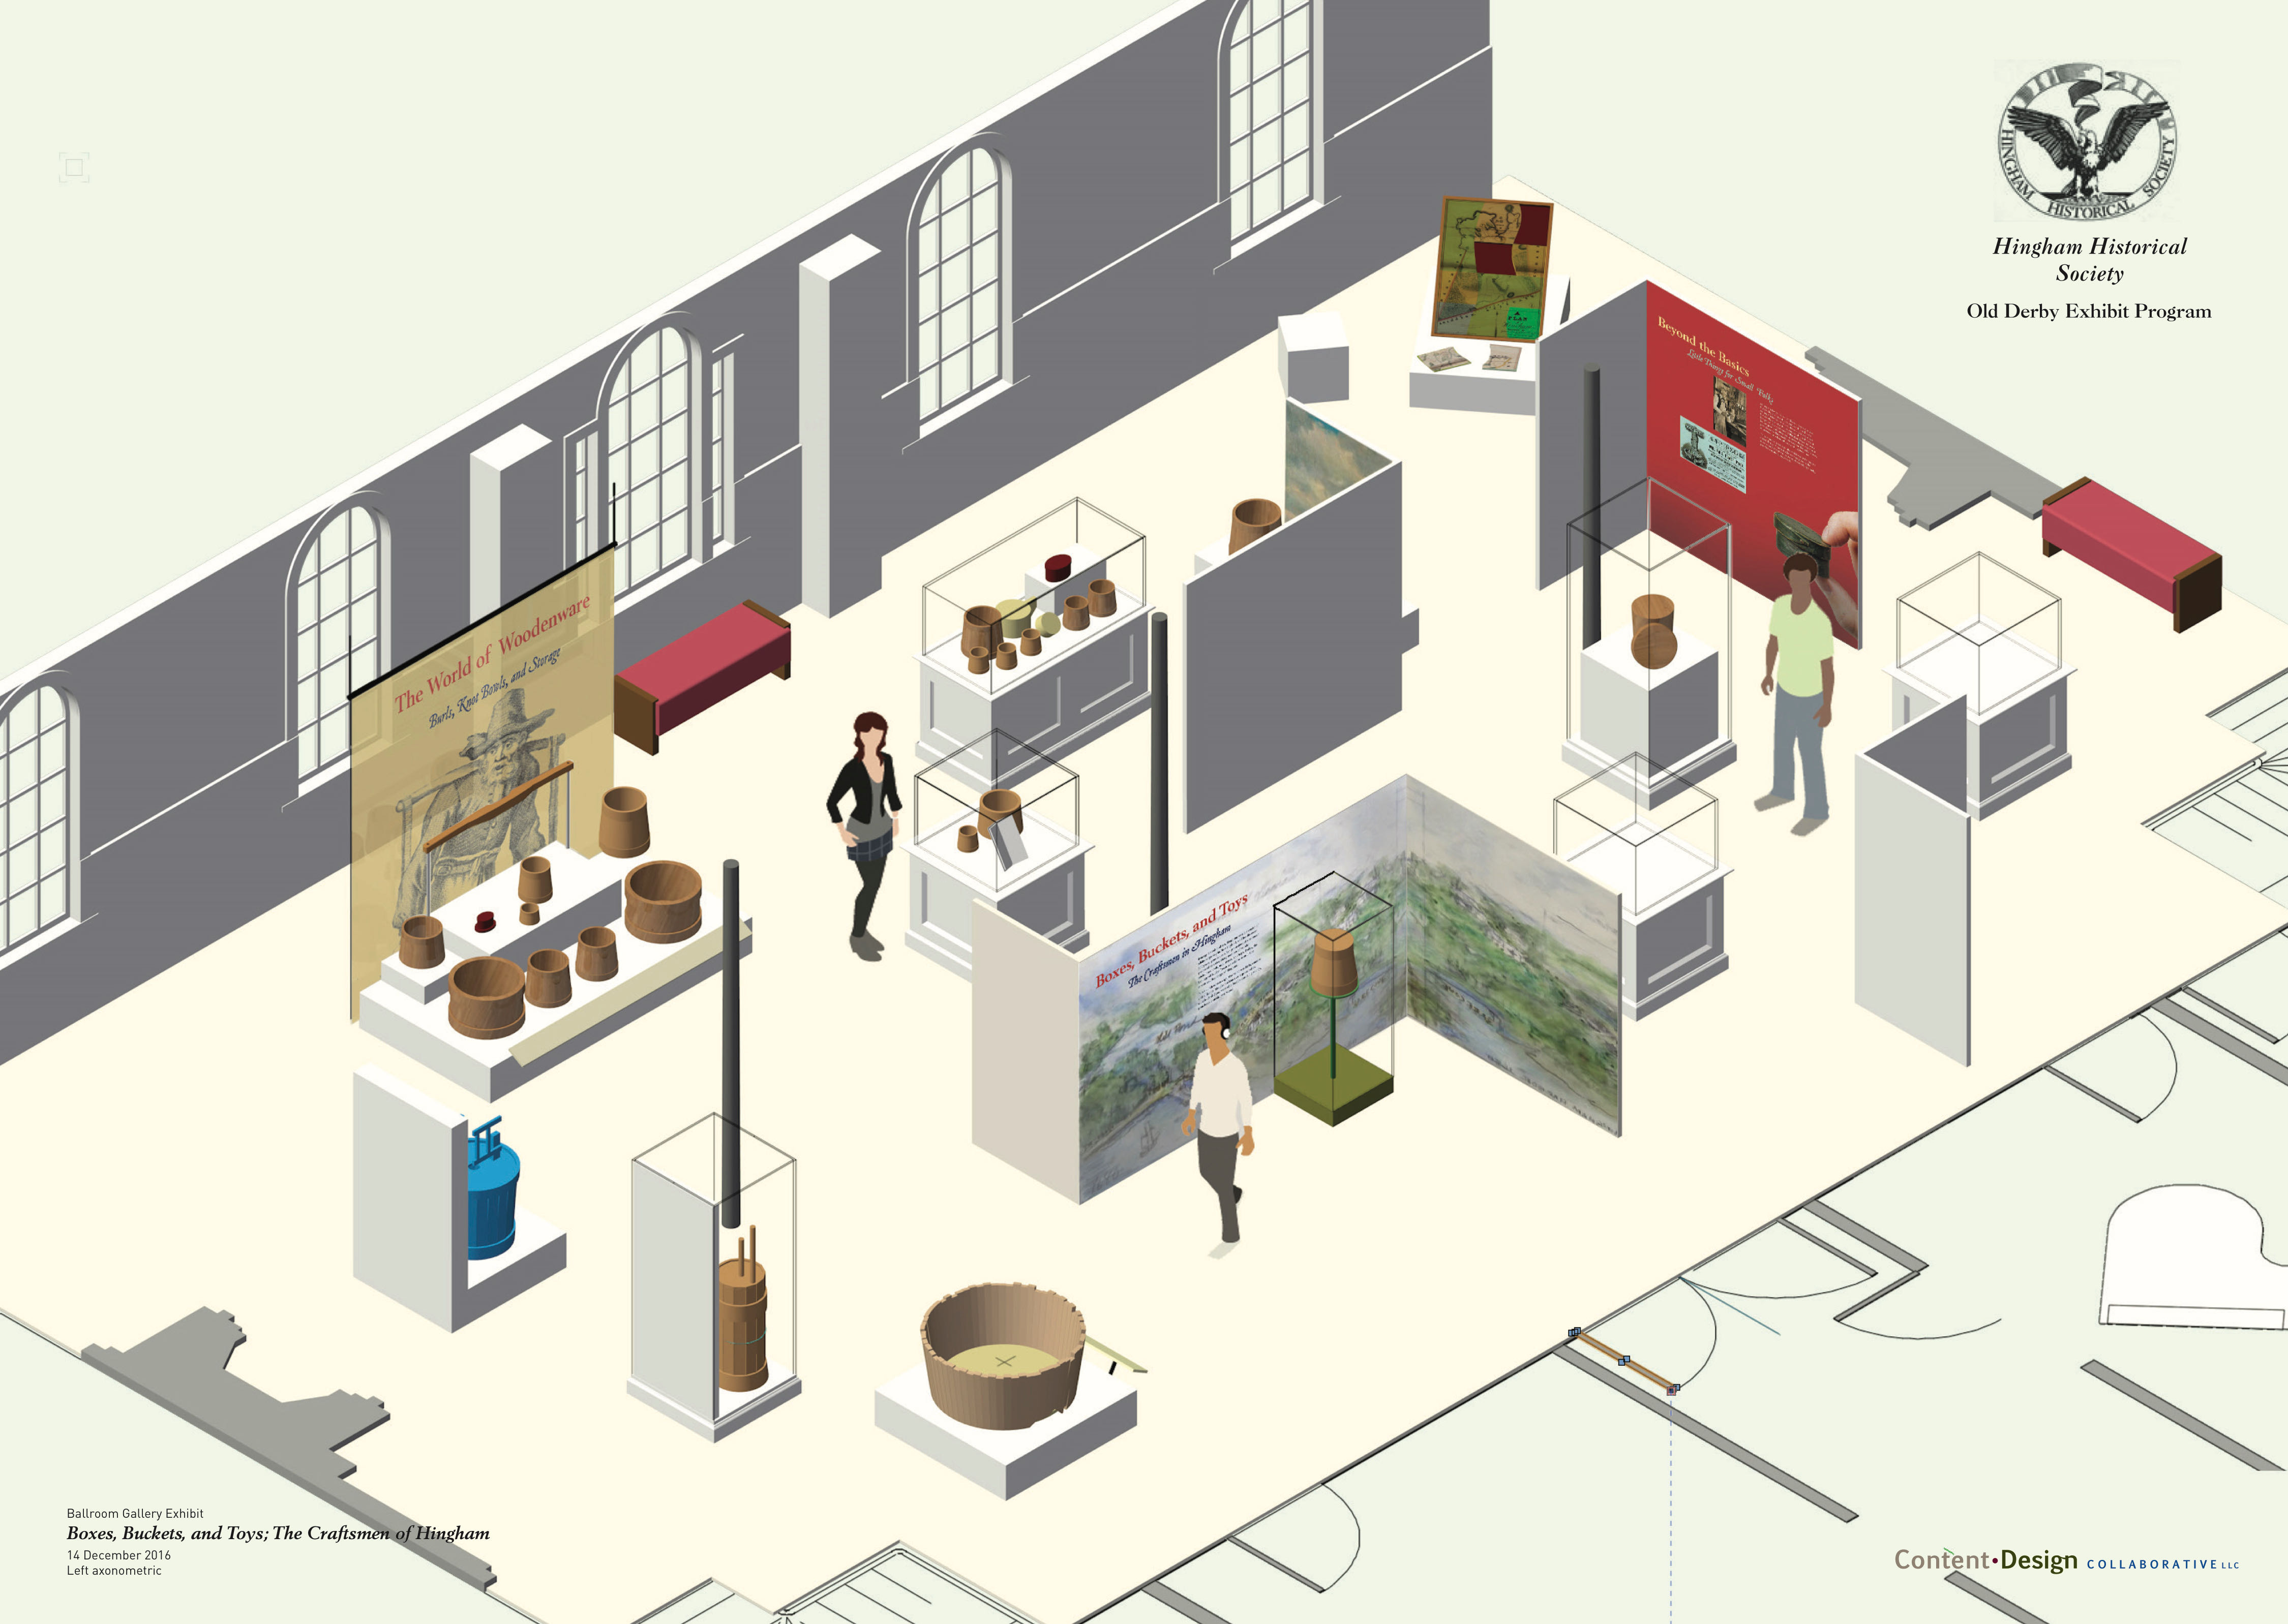 Ballroom Gallery Exhibit, introduction view